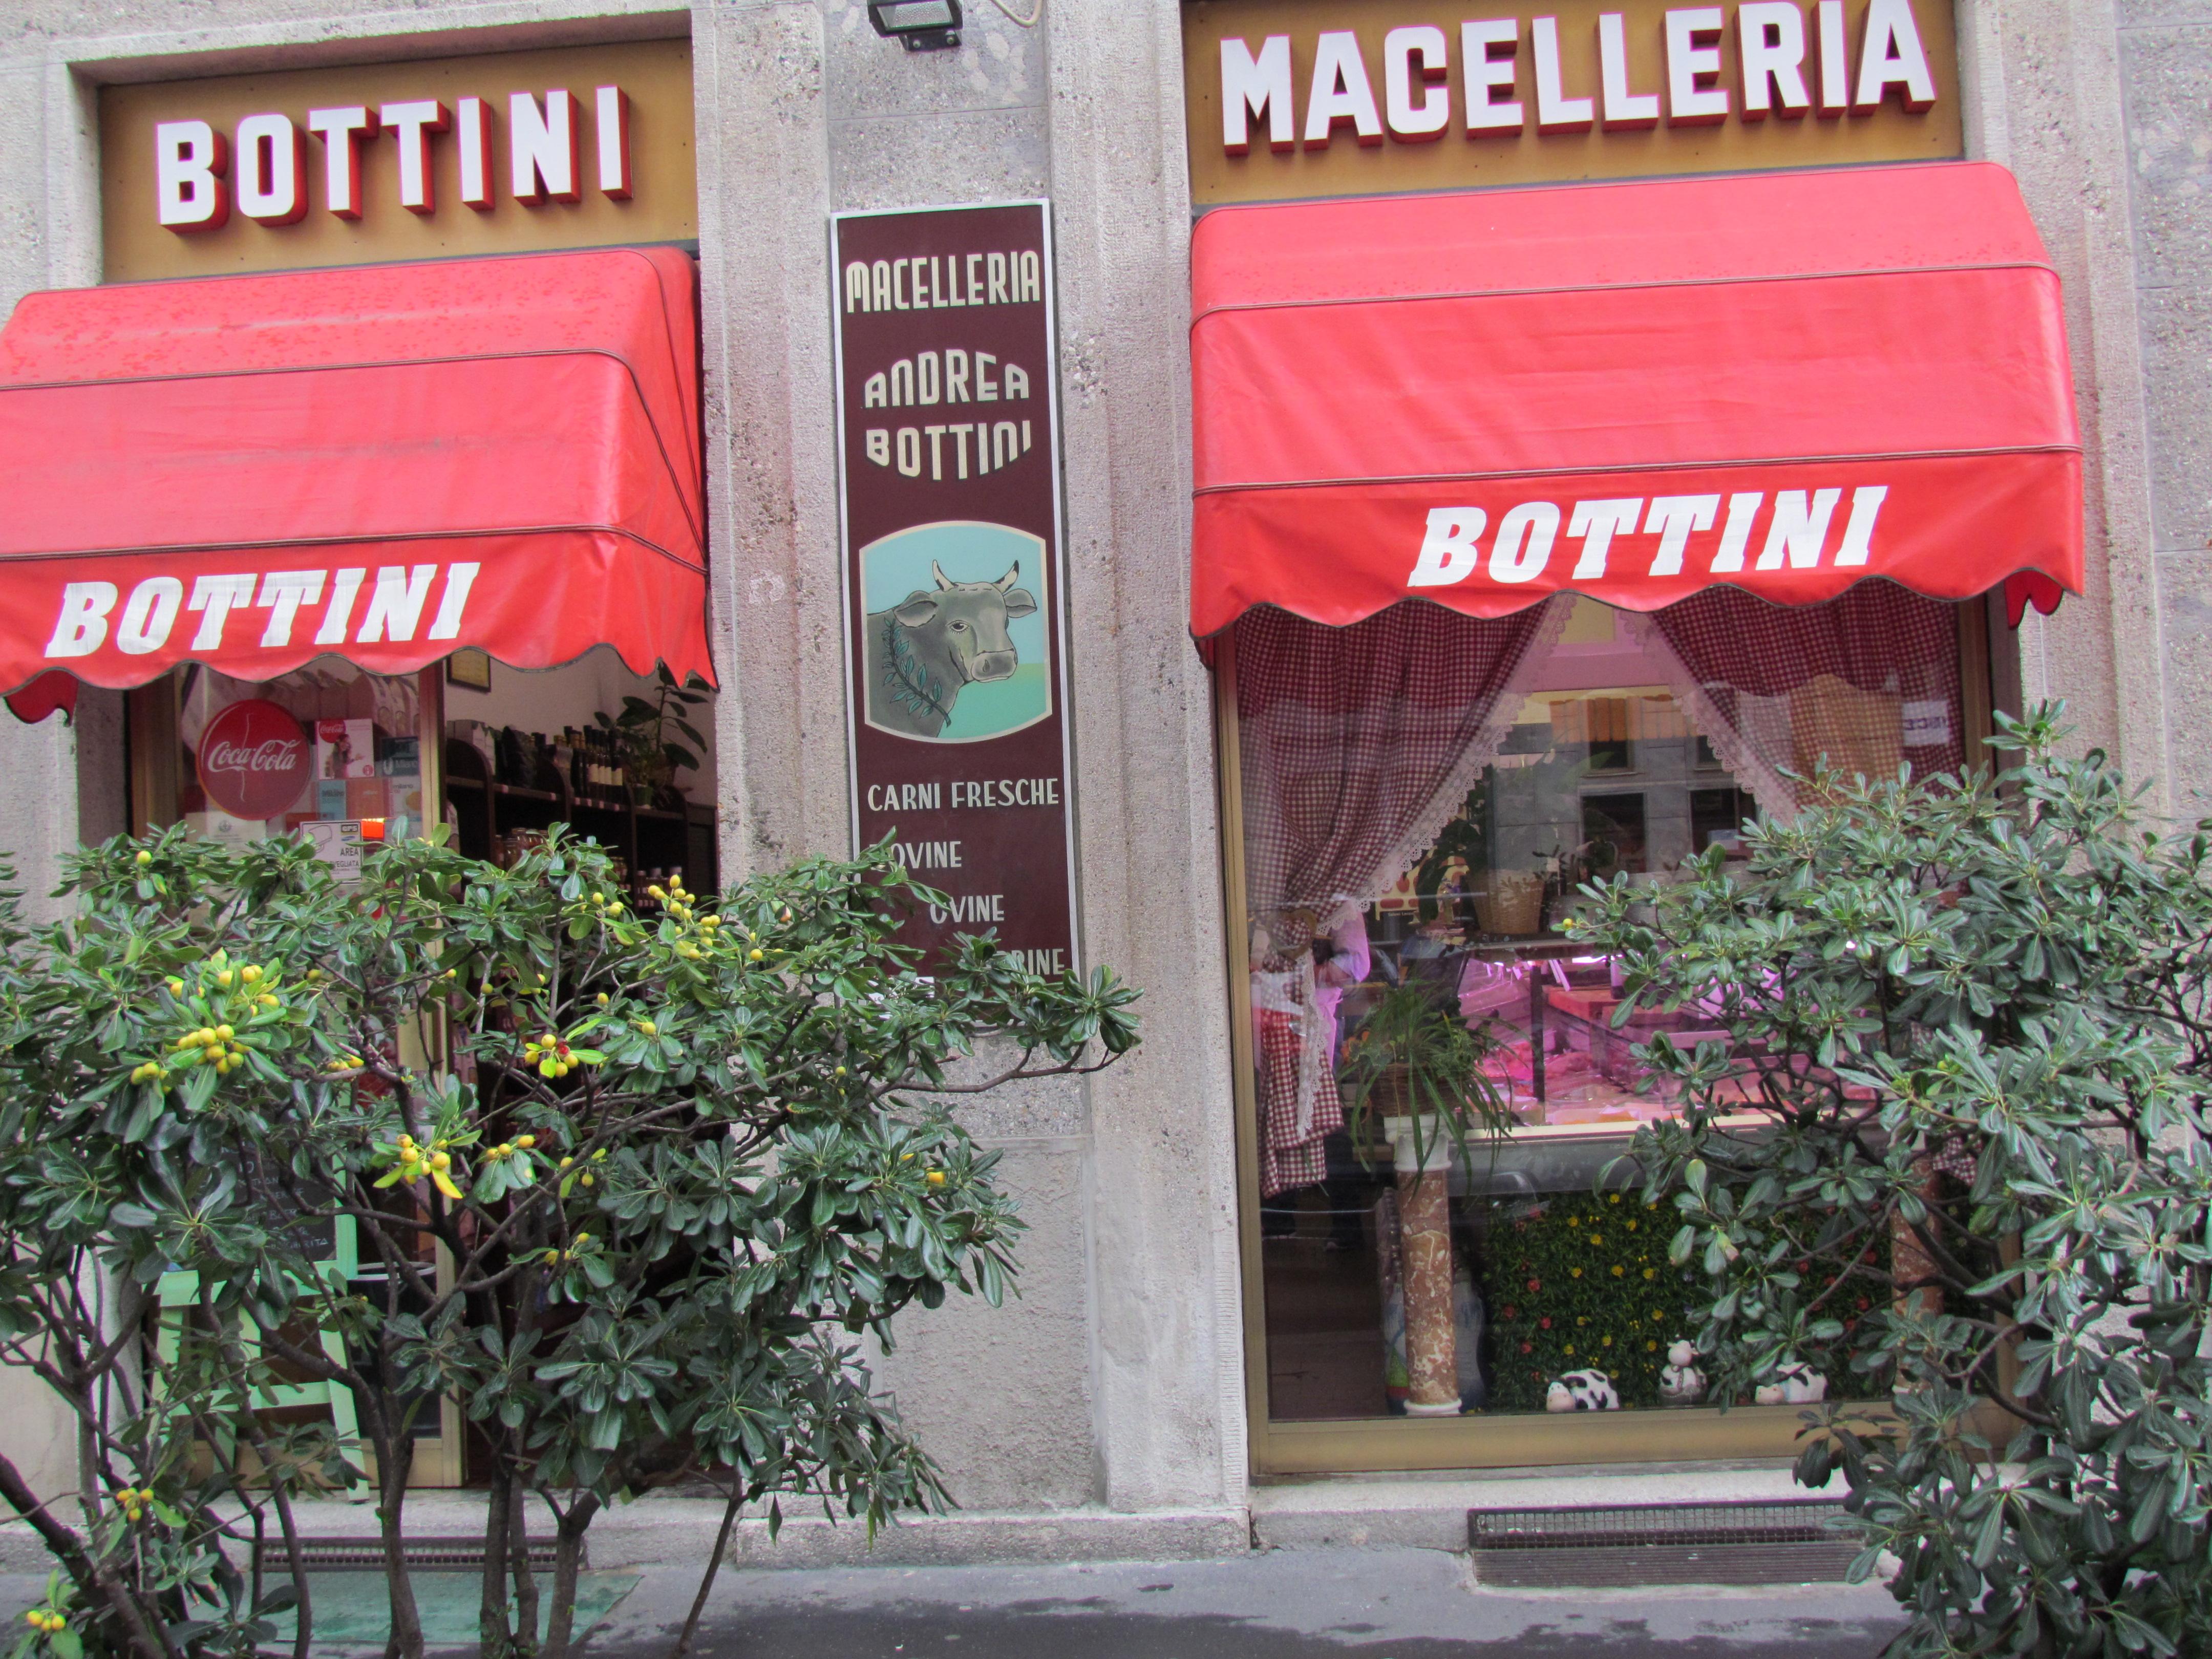 Macelleria Bottini logo